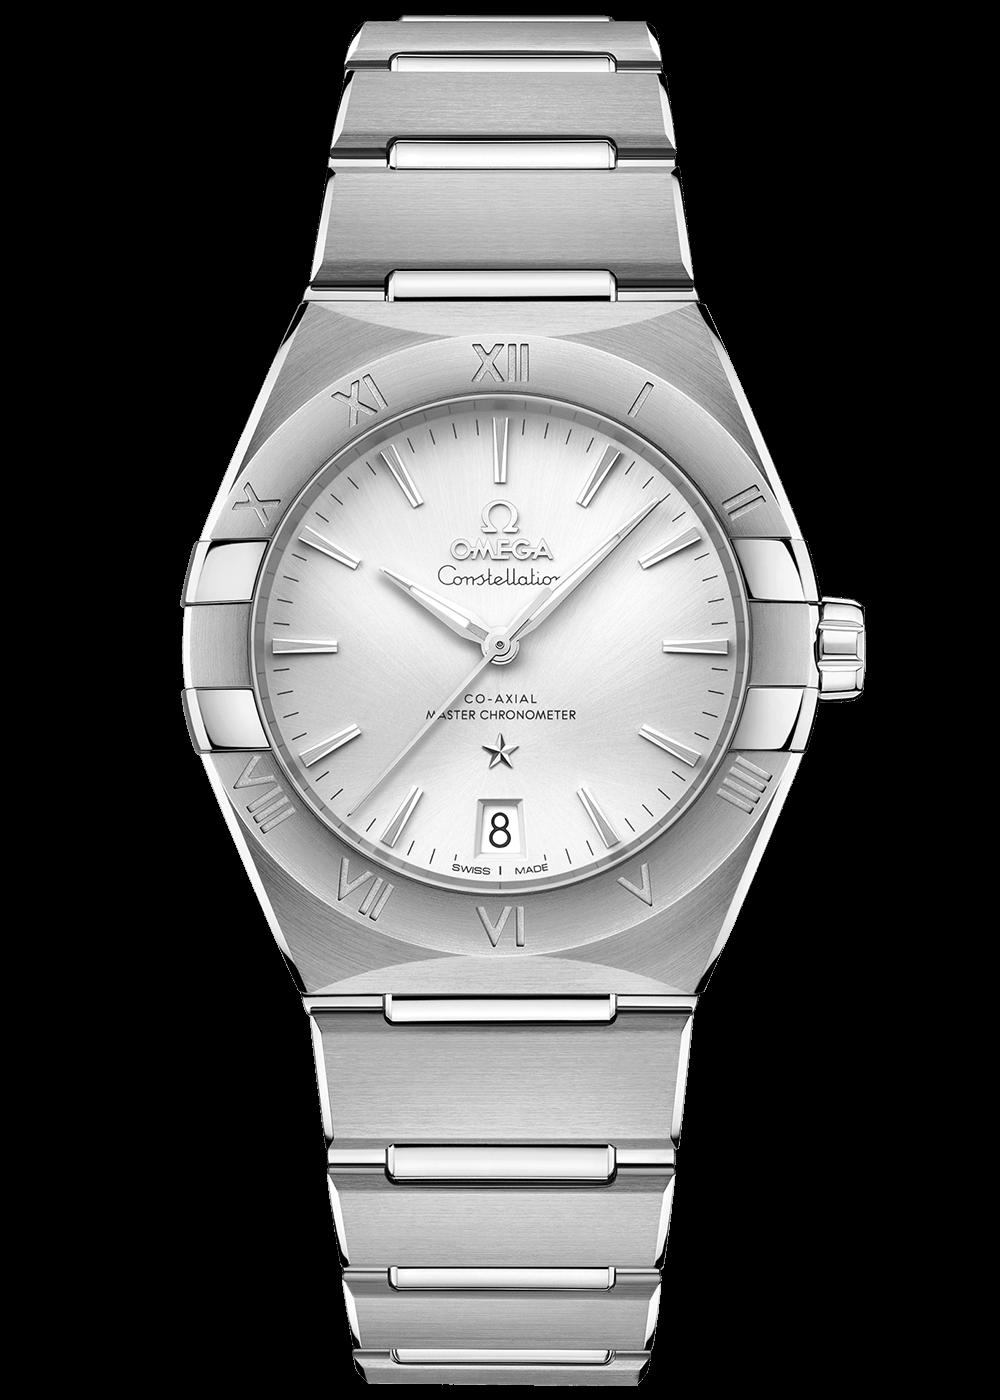 constellation-master-chronometer-36mm